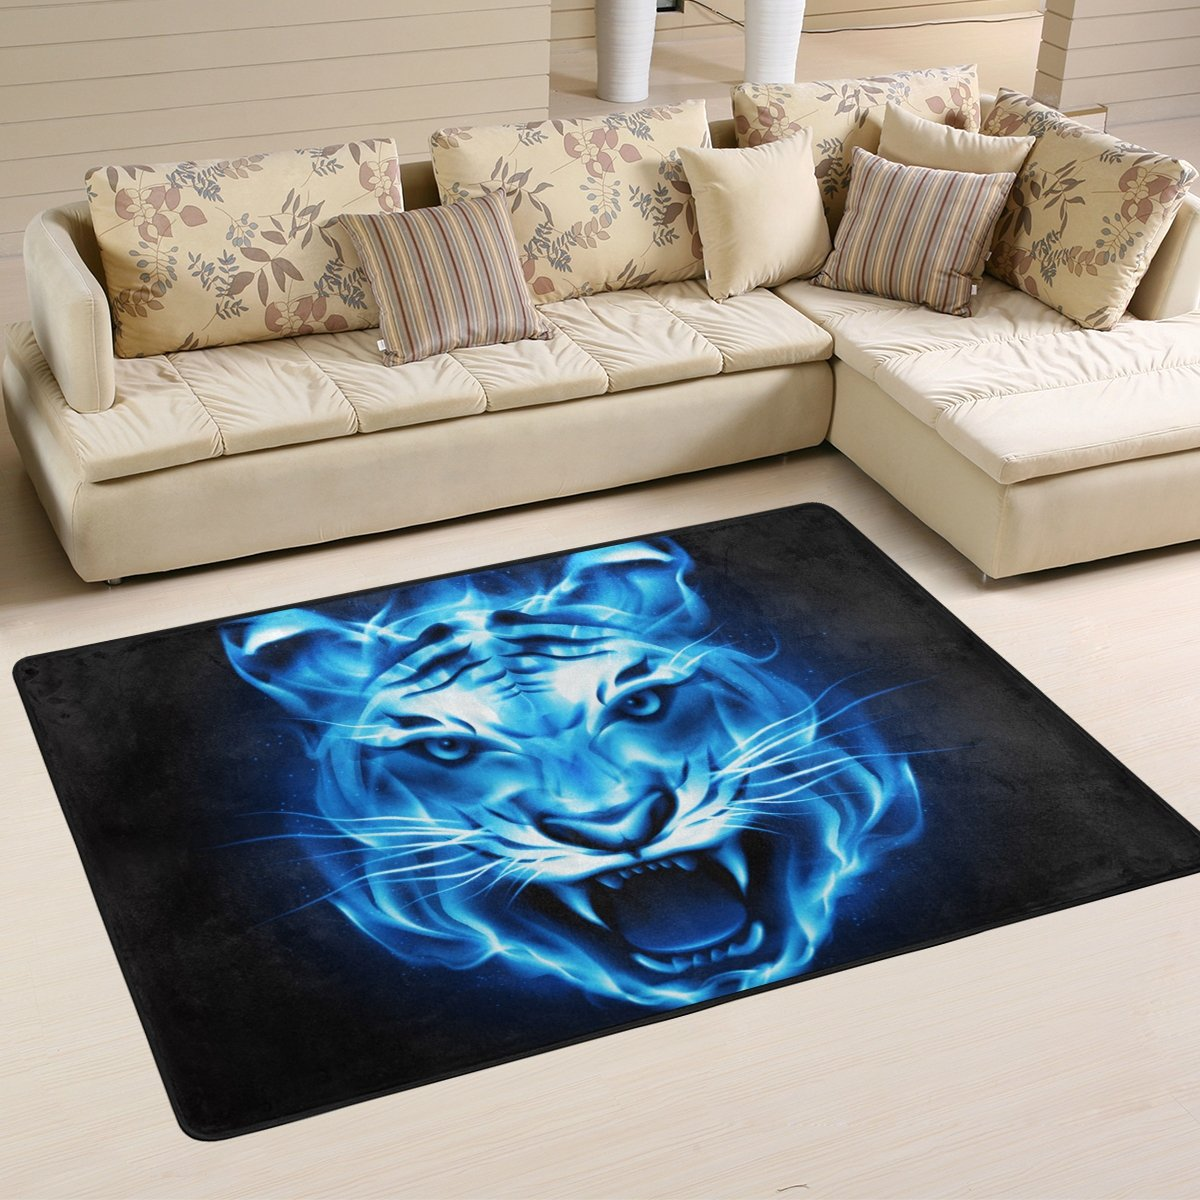 SAVSV 6' x 4' Area Rug Carpet Doormat Lightweight Printed Burning Blue Tiger Head Easy to Clean For Living Room Bedroom